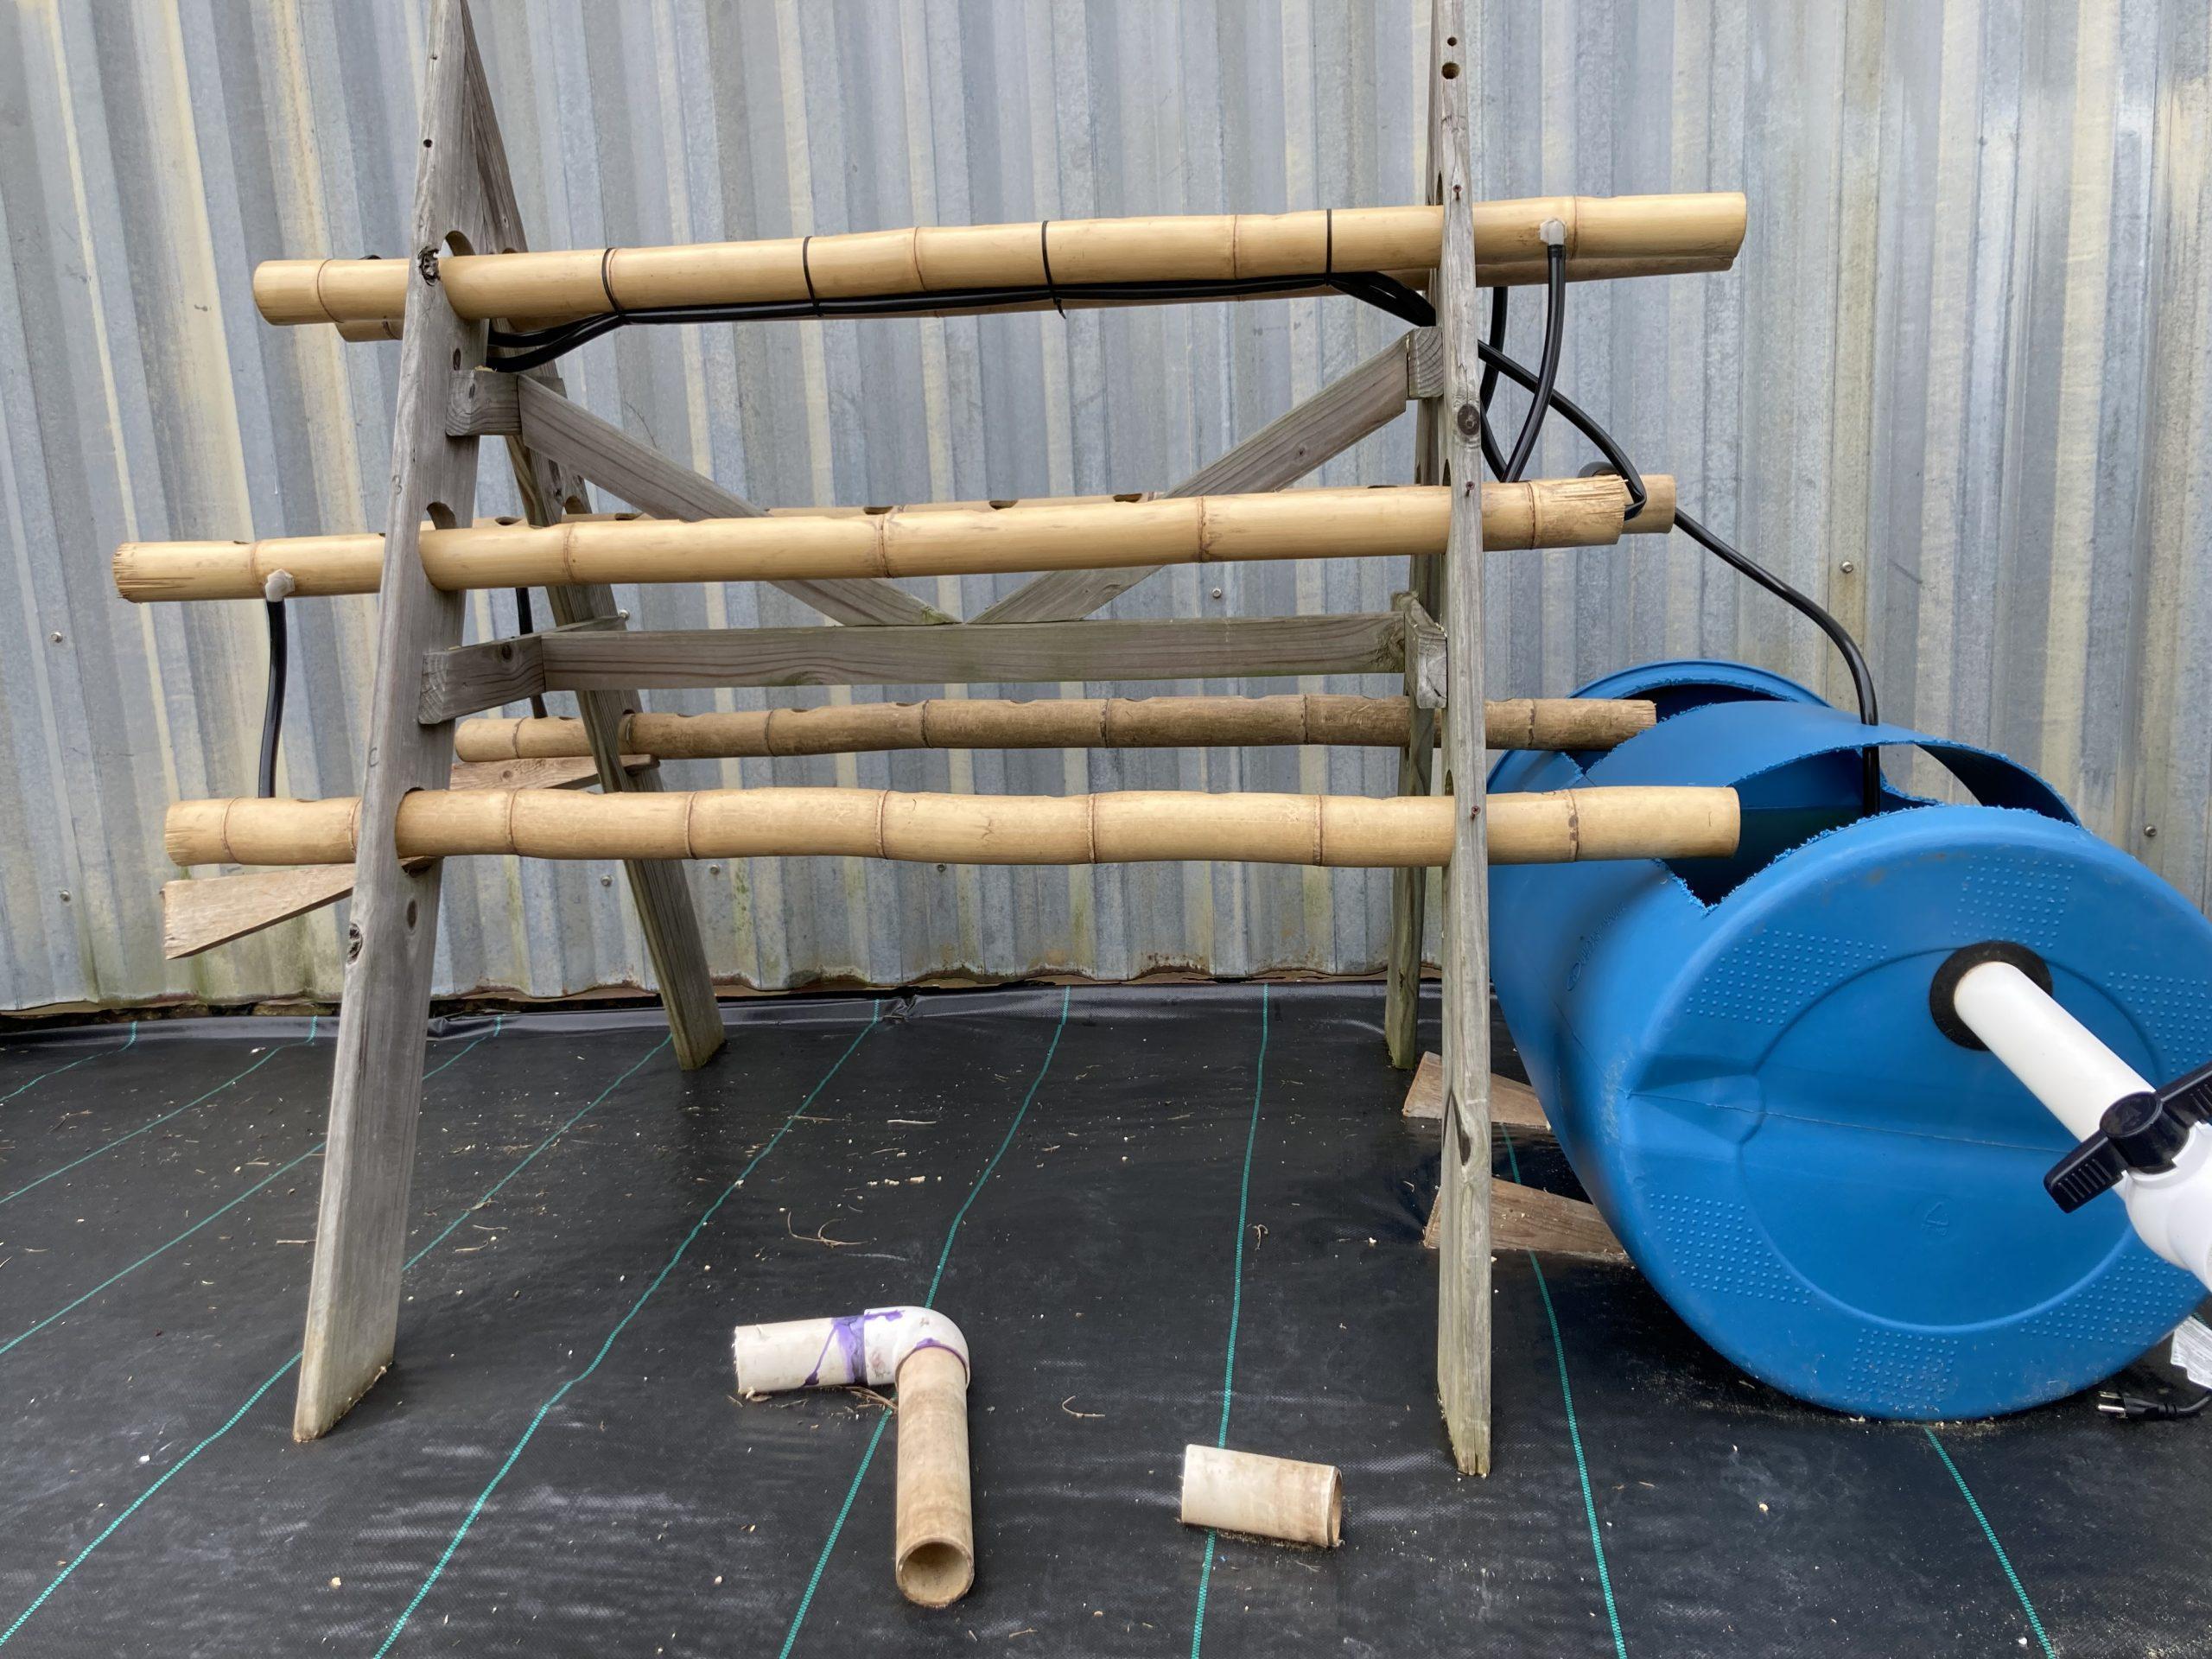 A demonstration aquaponics system